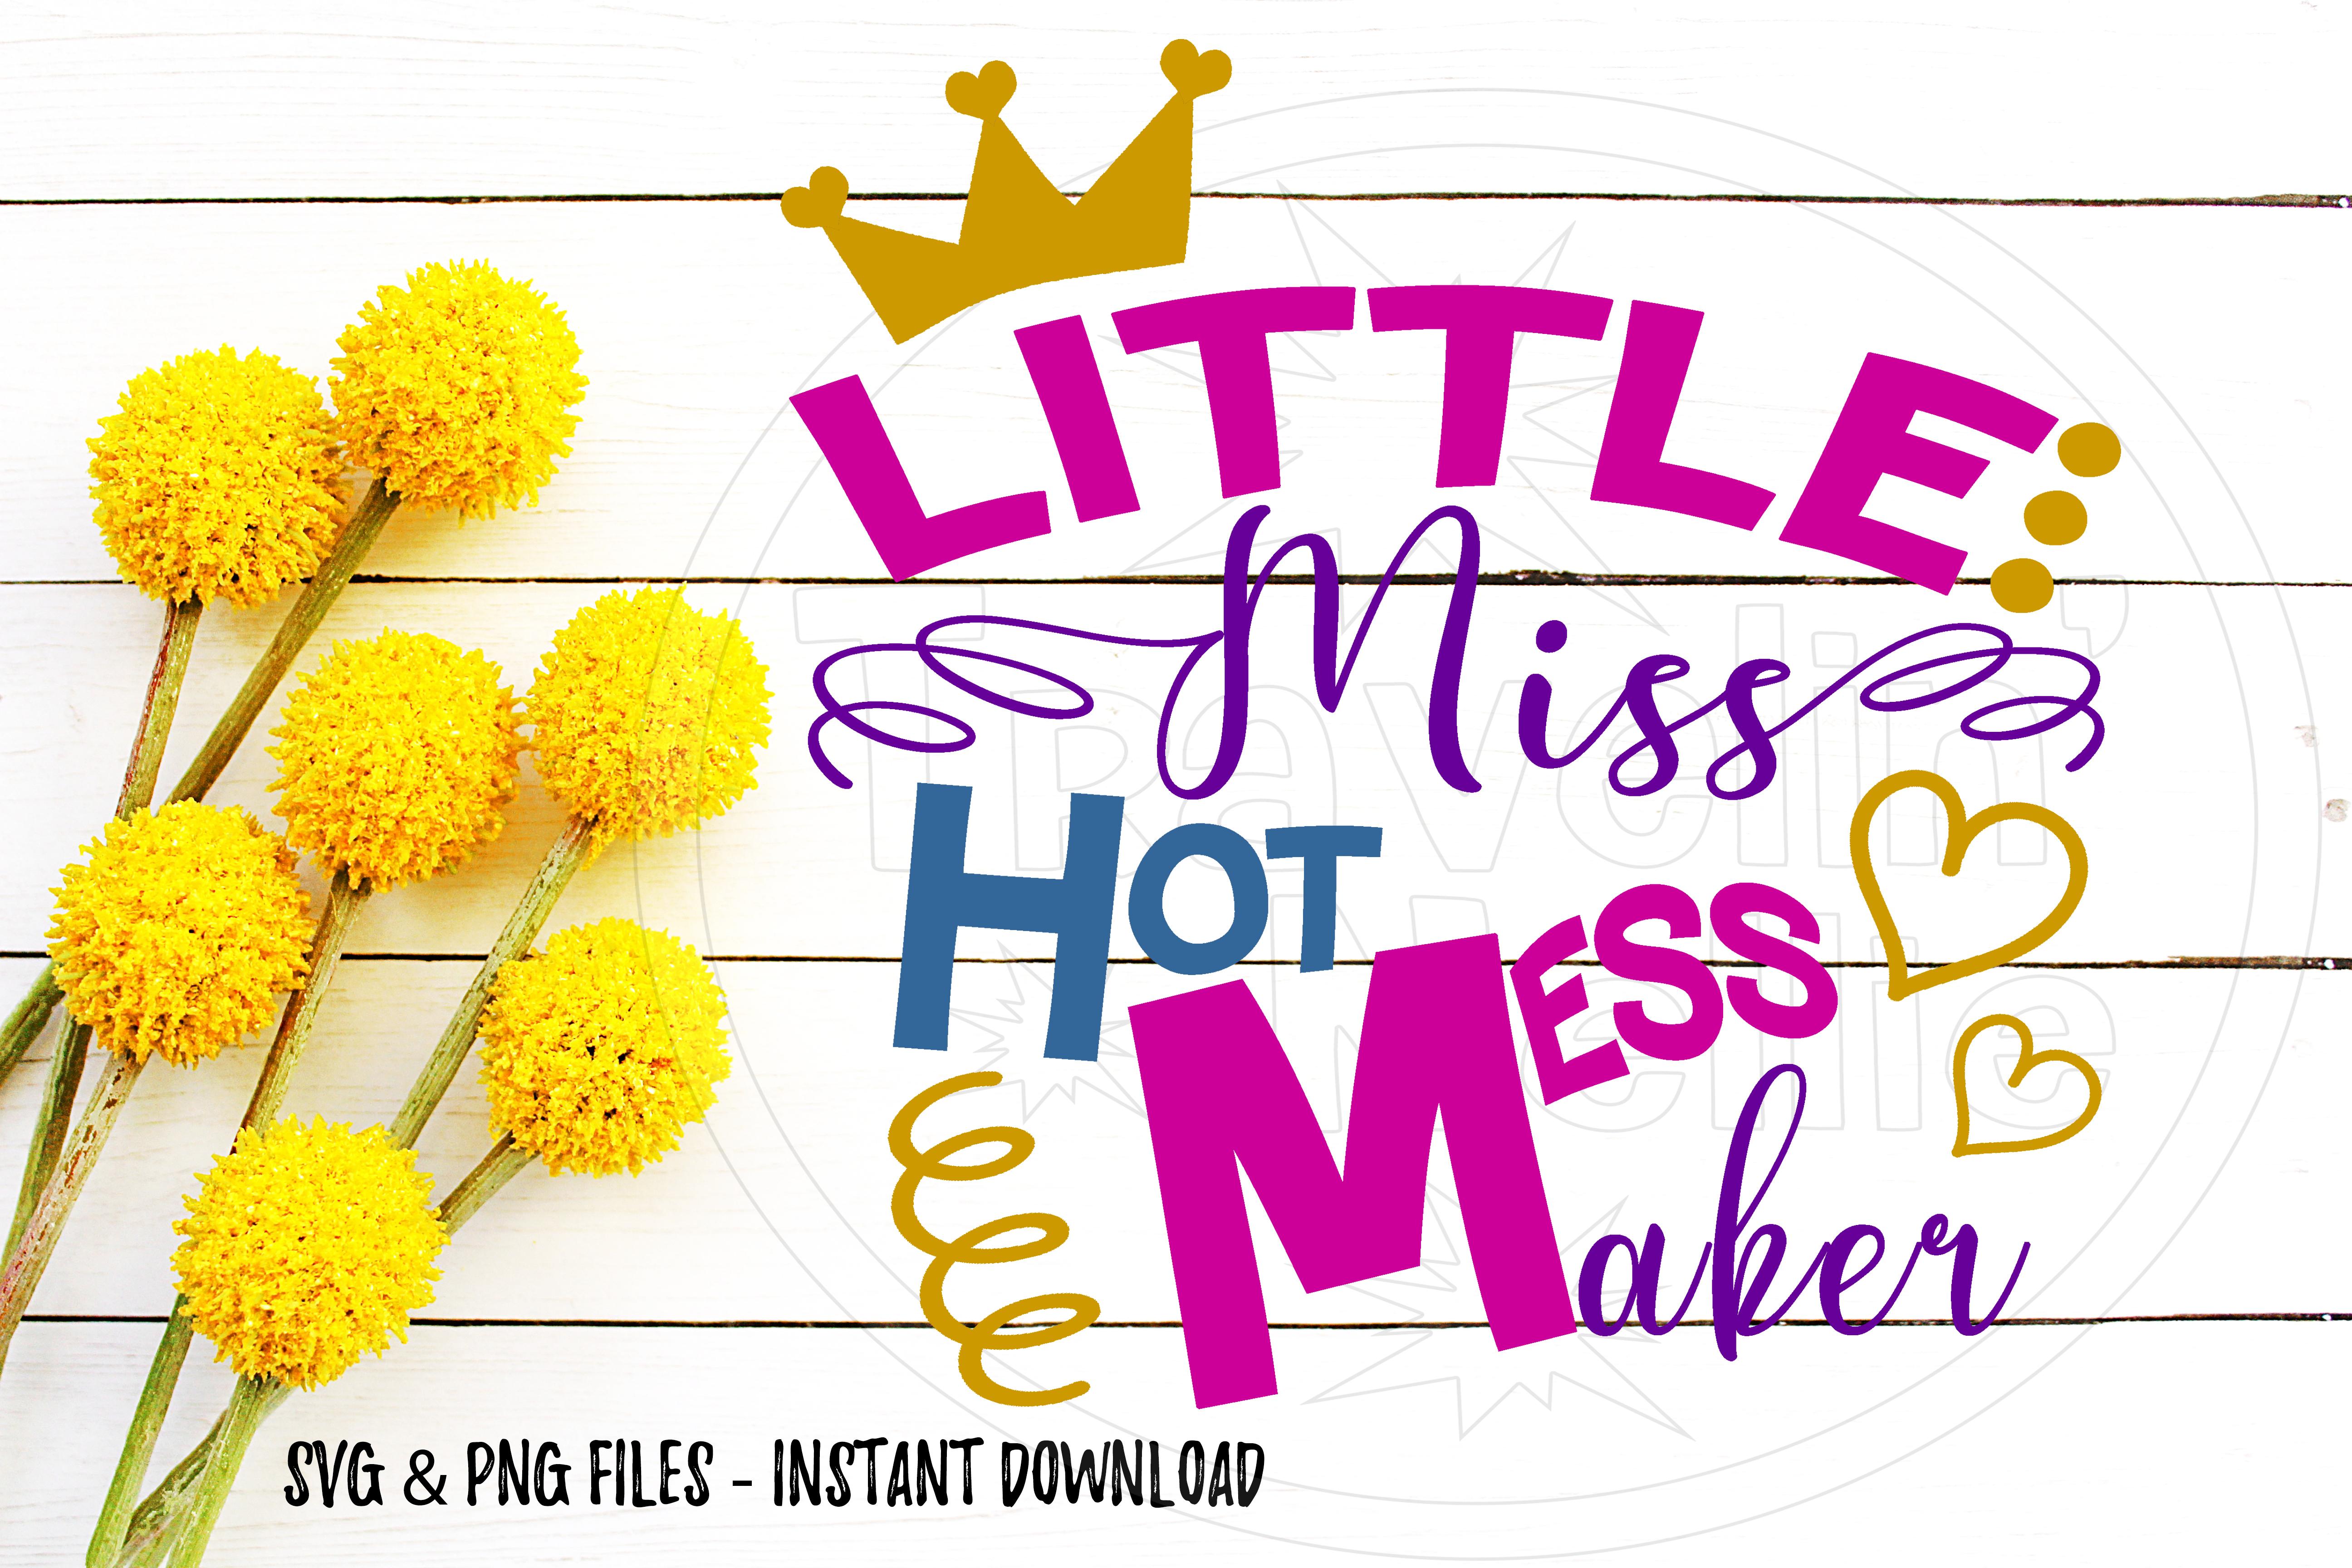 Little Miss Hot Mess Maker Svg Image Design For Vinyl Cutters Print Diy Design Brother Cricut Cameo Cutout 94544 Svgs Design Bundles